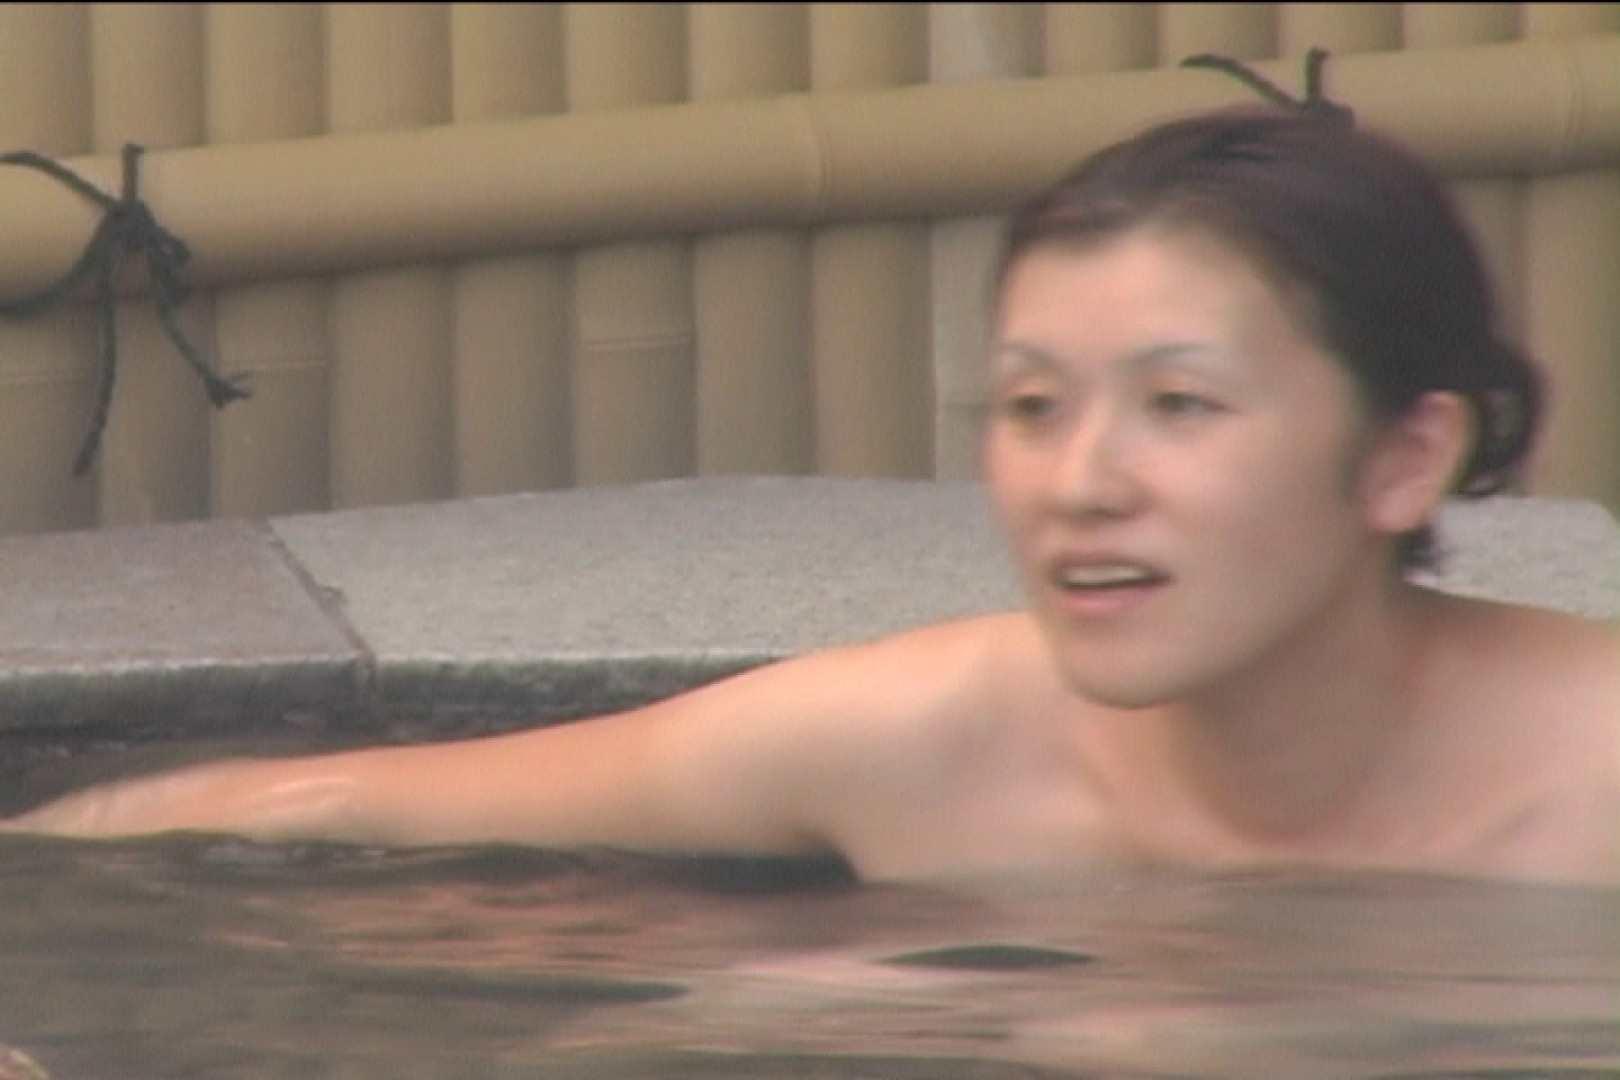 Aquaな露天風呂Vol.532 盗撮シリーズ | 露天風呂編  104PIX 71